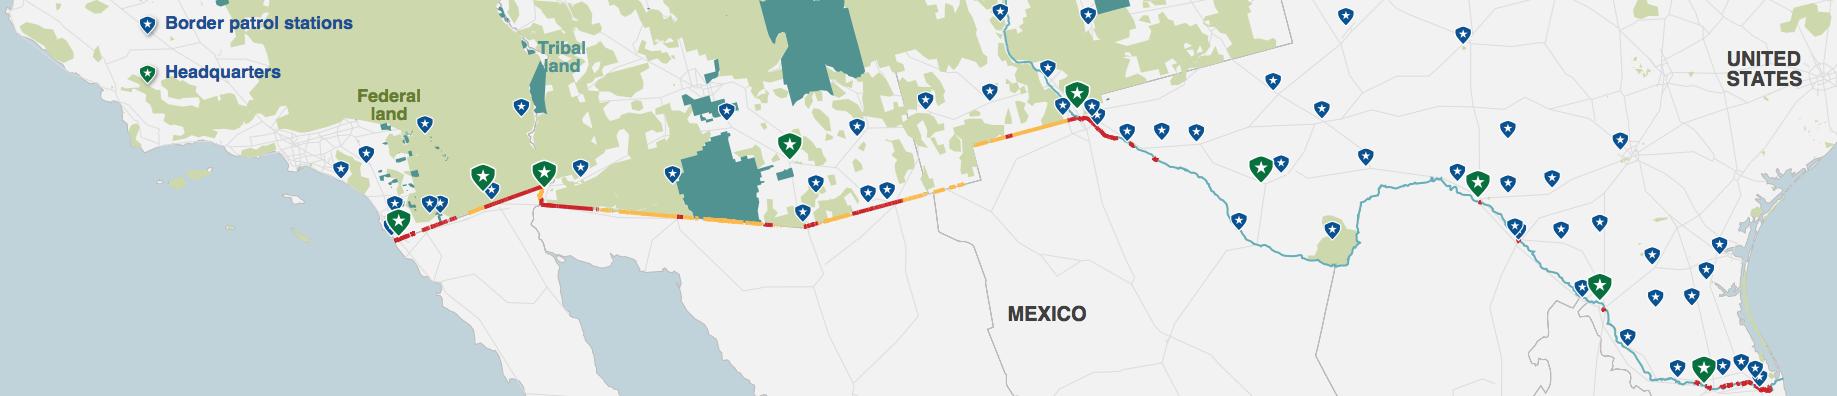 Border Terrain:lands